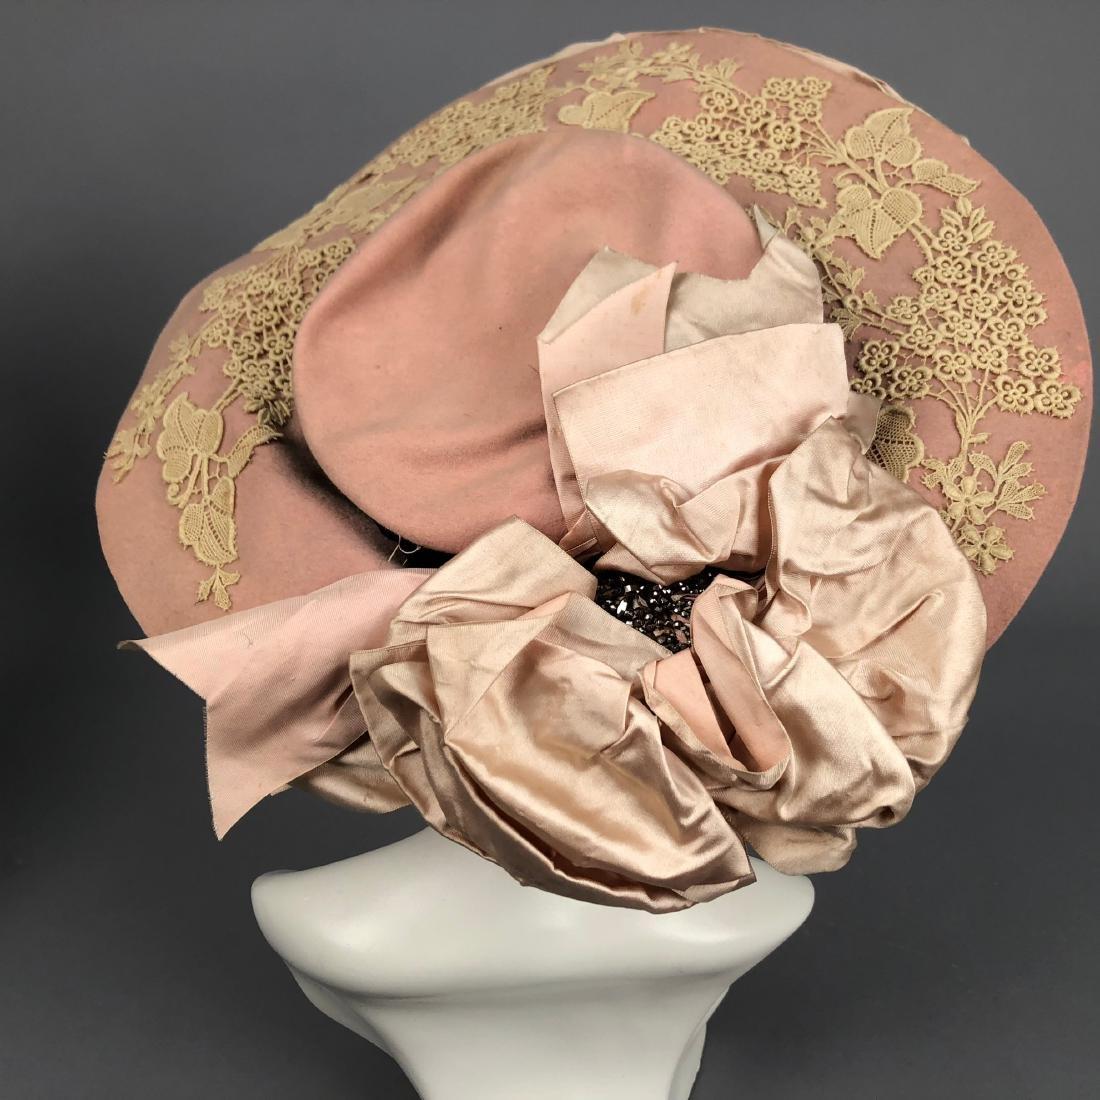 THREE WIDE-BRIM HATS, 1902 - 1910 - 3